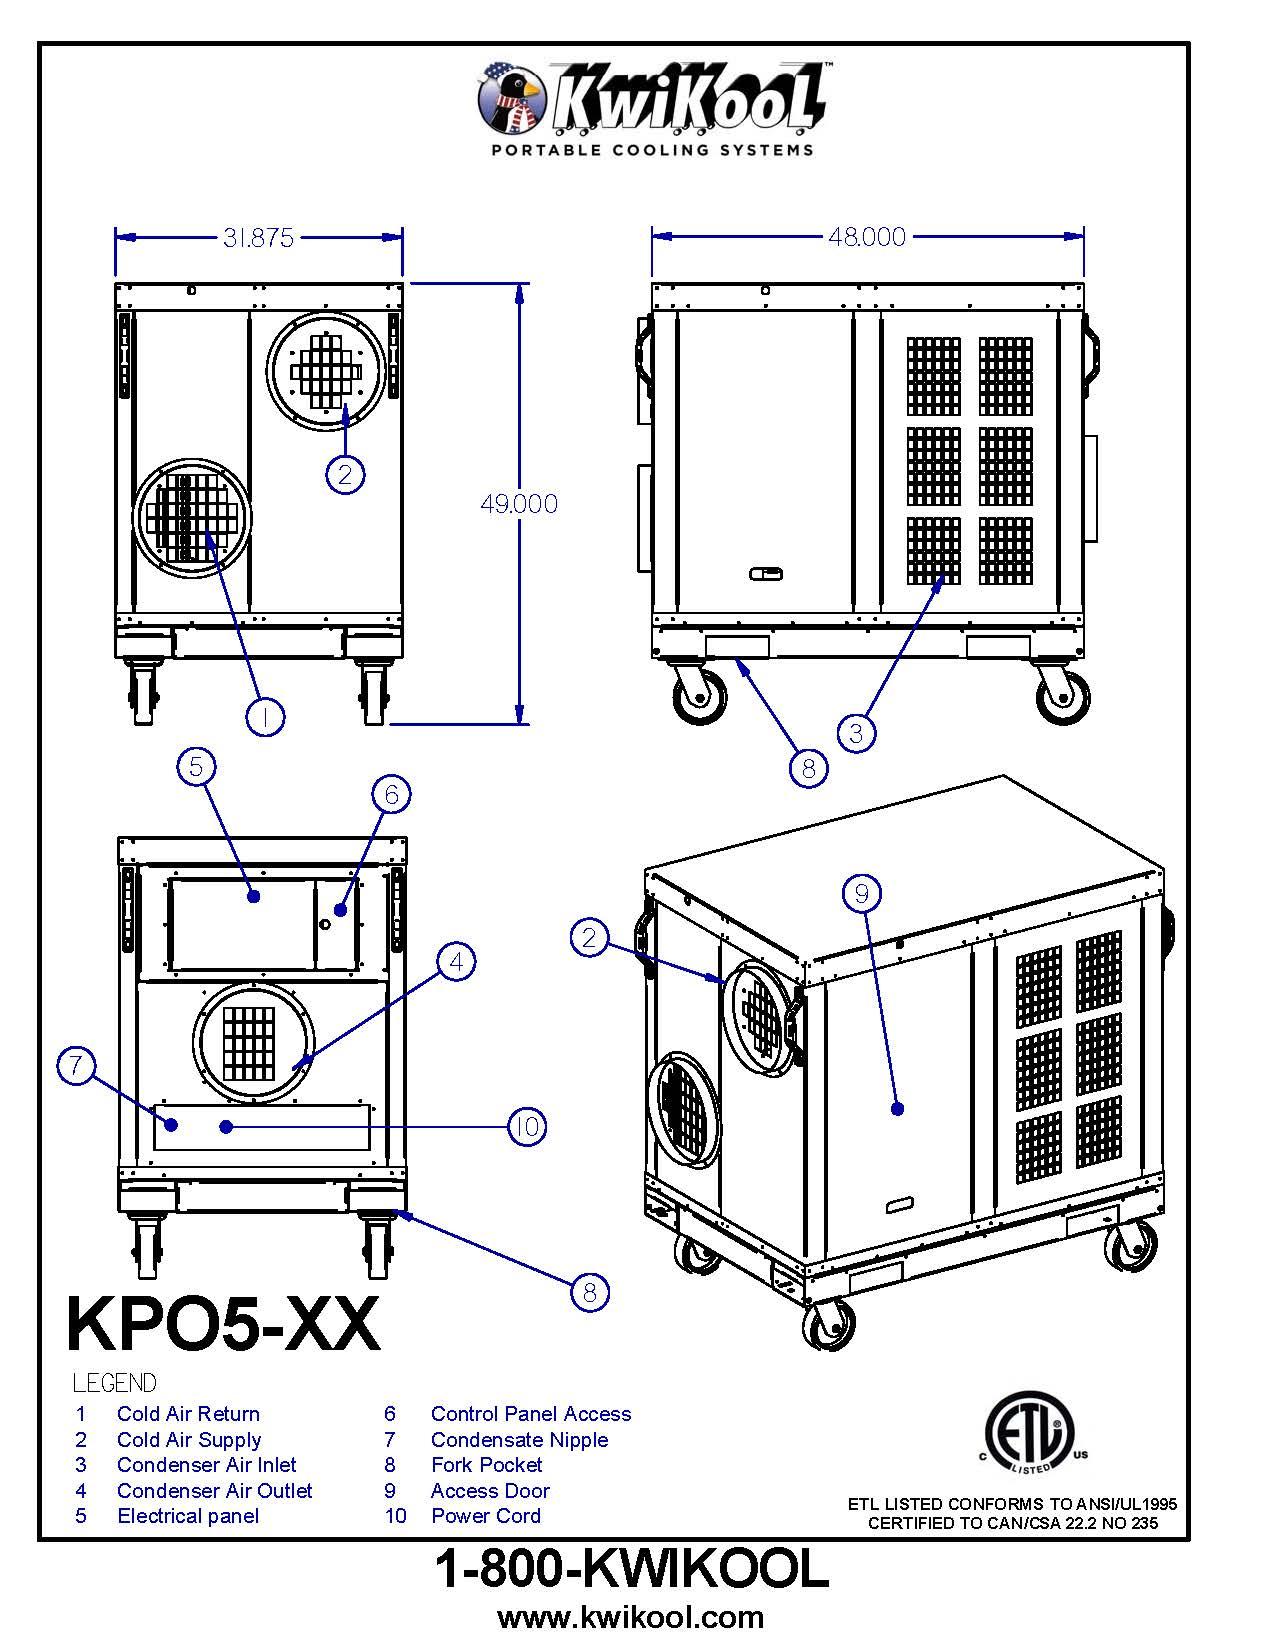 KPO5DD